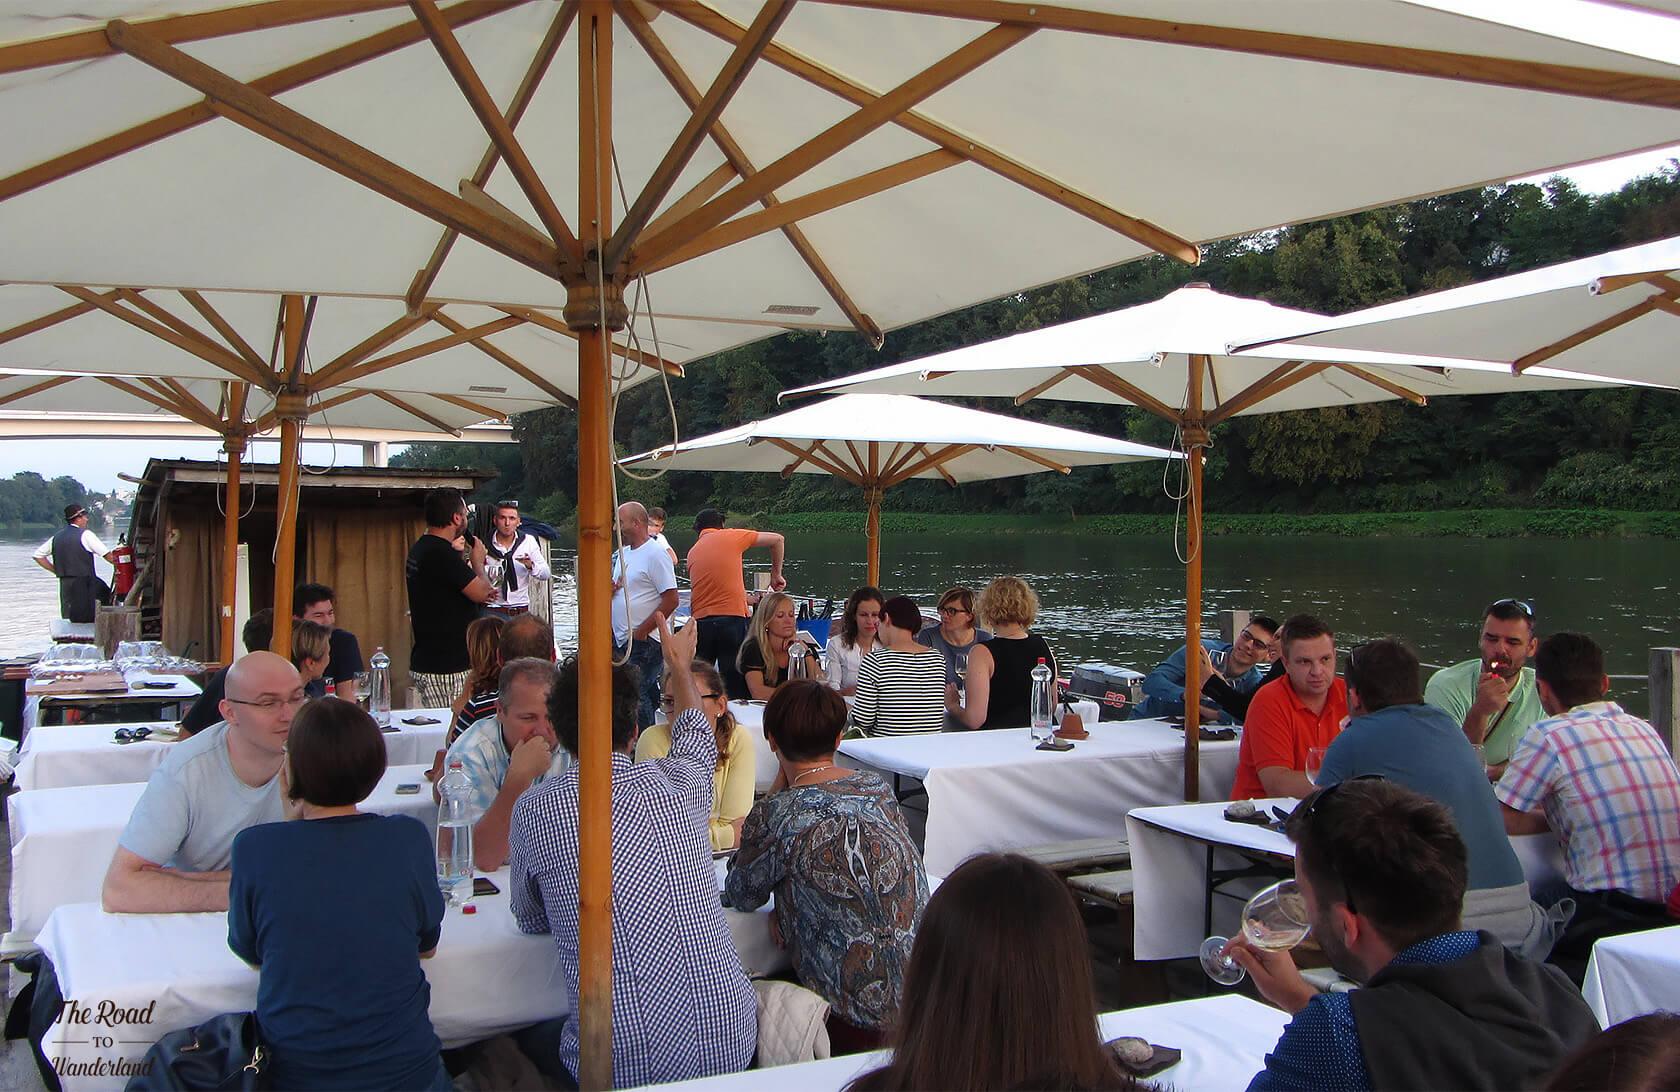 Vinoo.co wine cruise on the Drava, Maribor